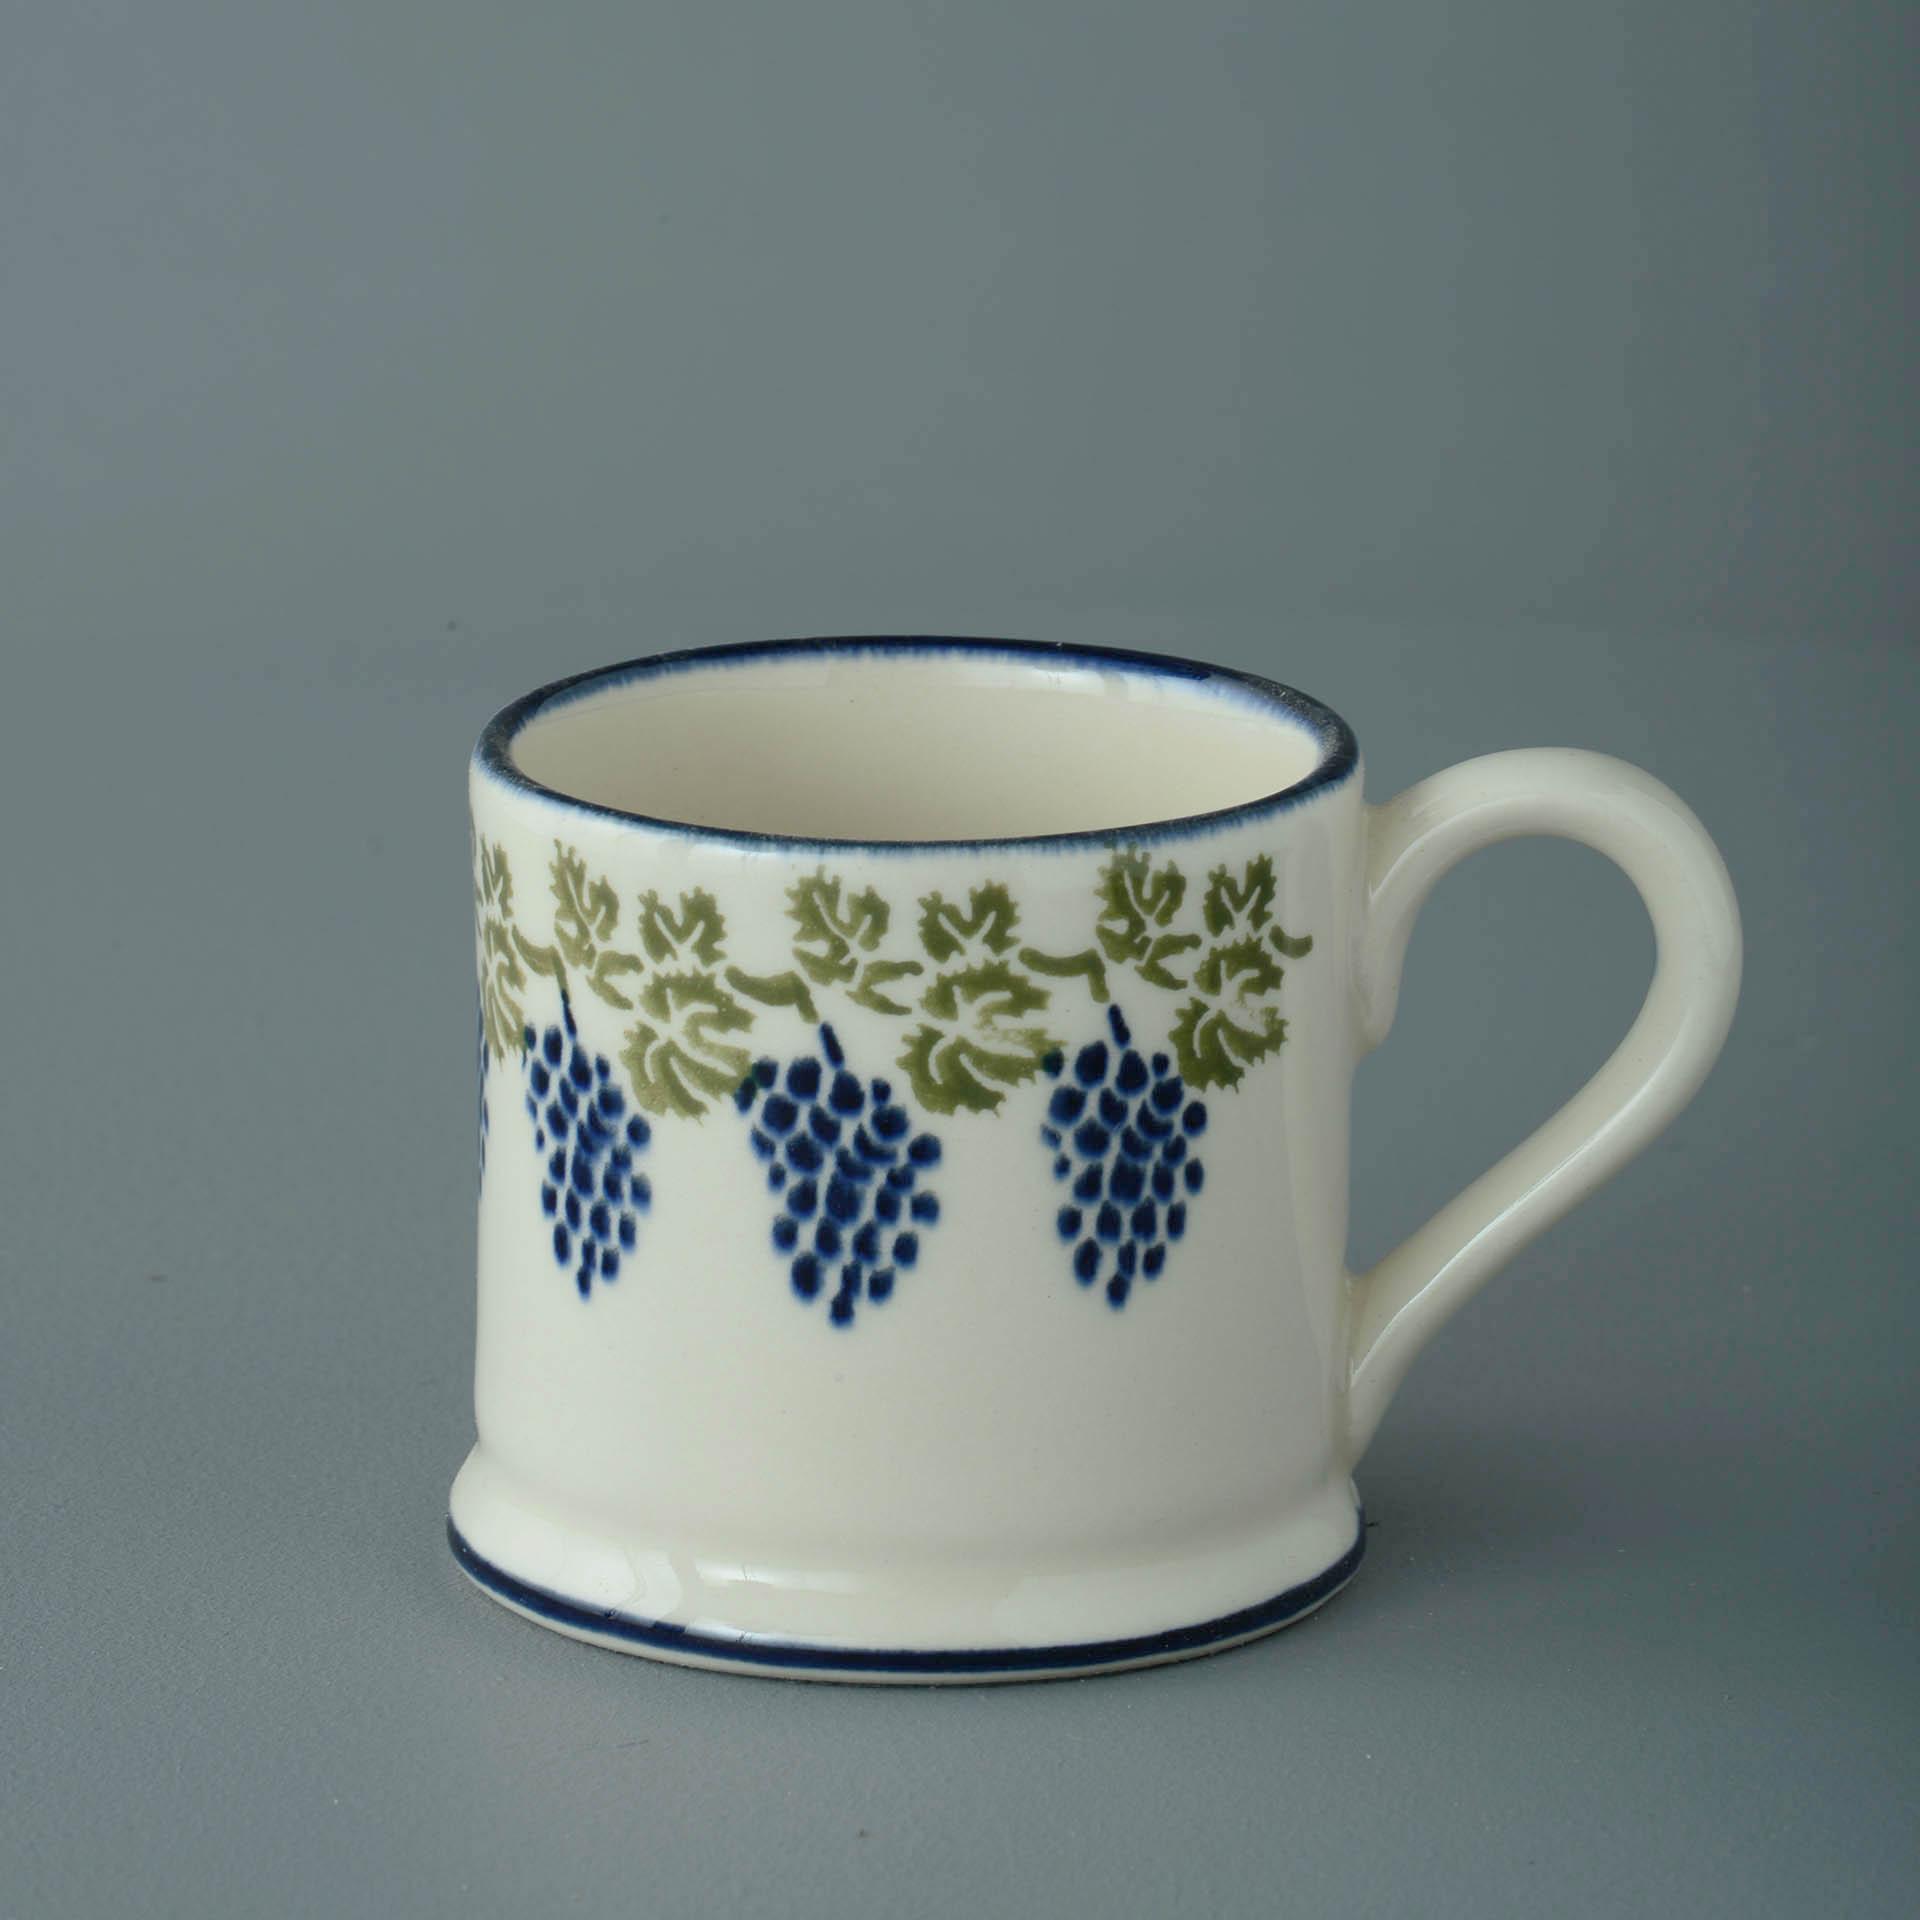 Grapes and Vine 150ml Small Mug 7 x 7.3cm